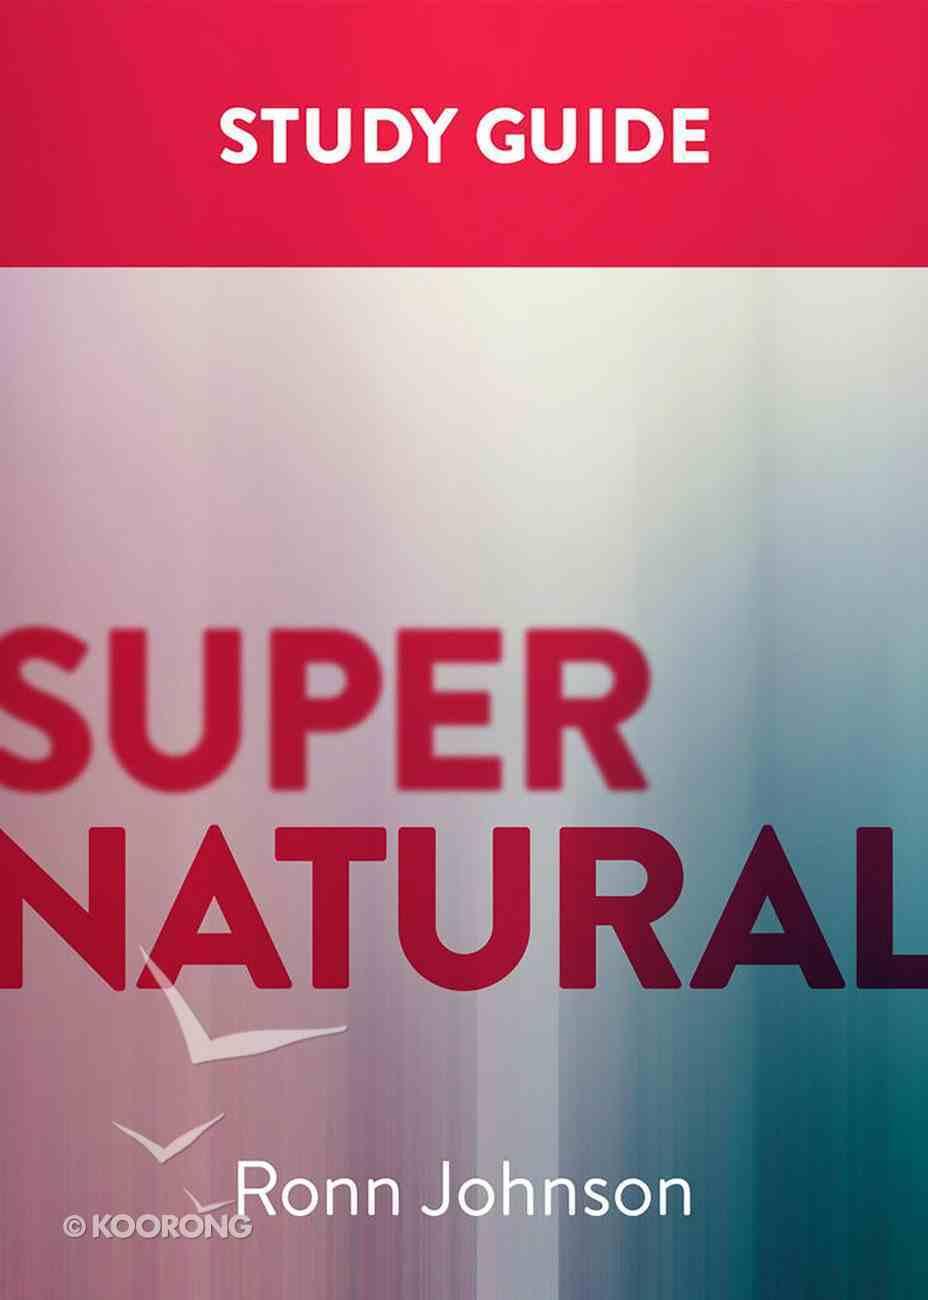 Supernatural: A Study Guide Paperback